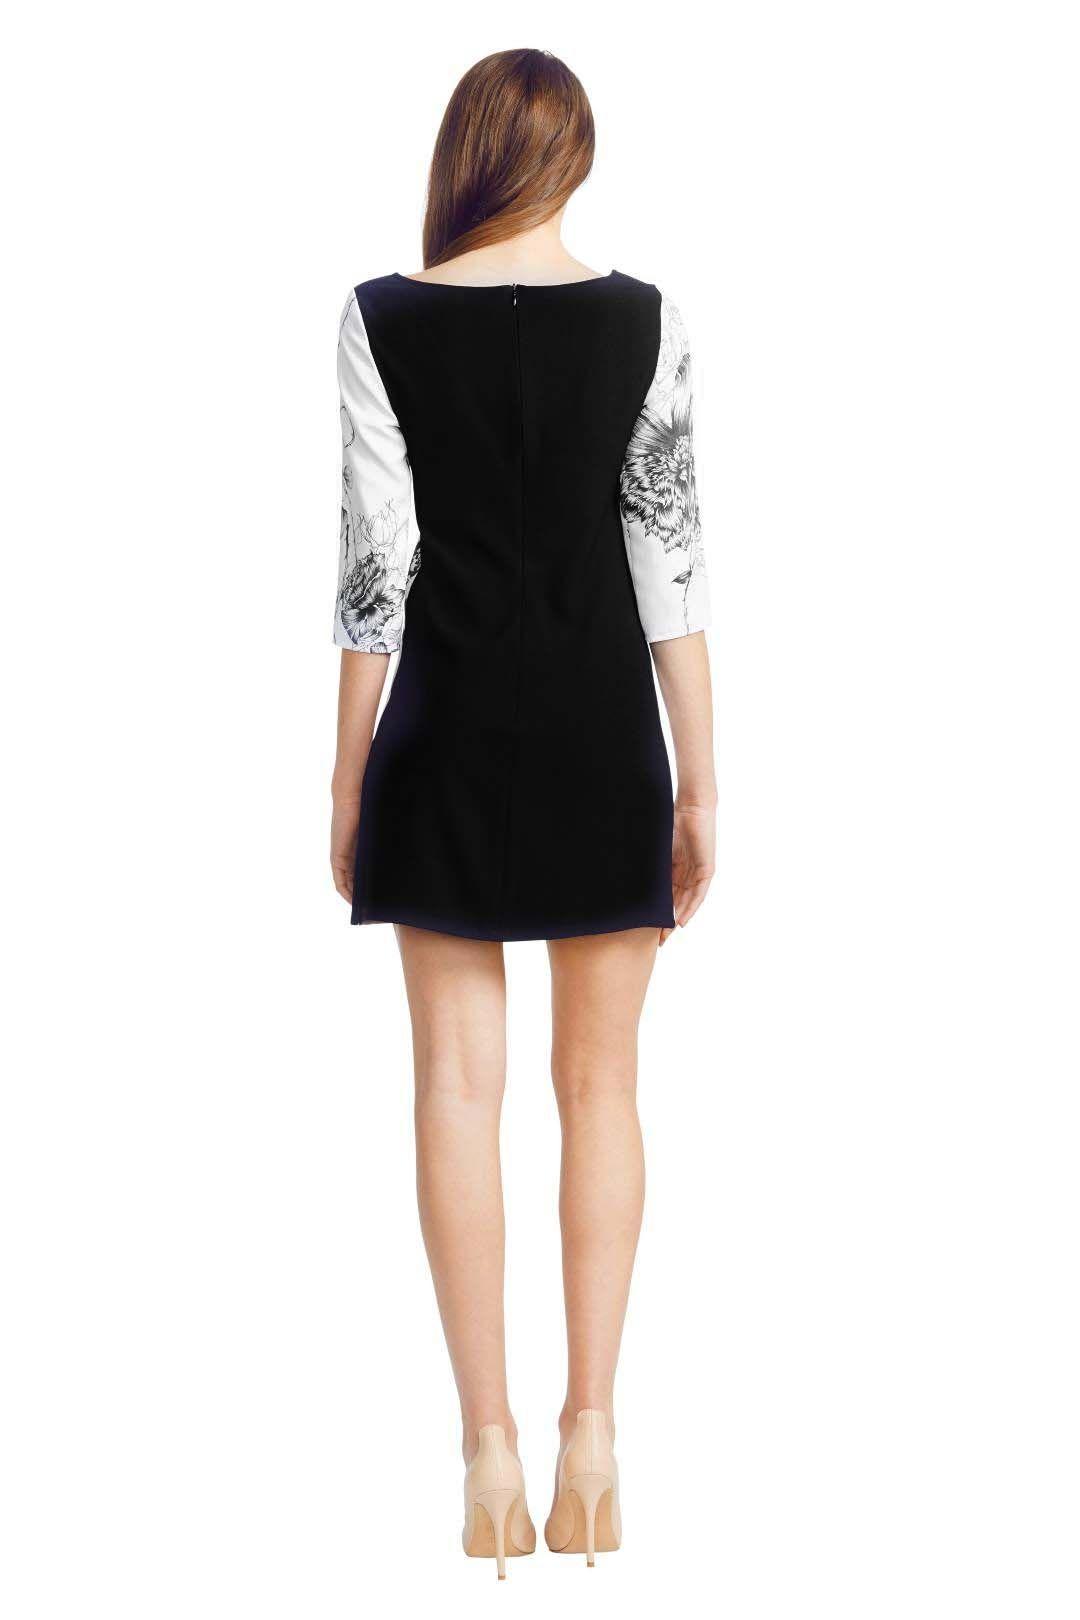 Sara Phillips - Phase Dress - Prints - Back